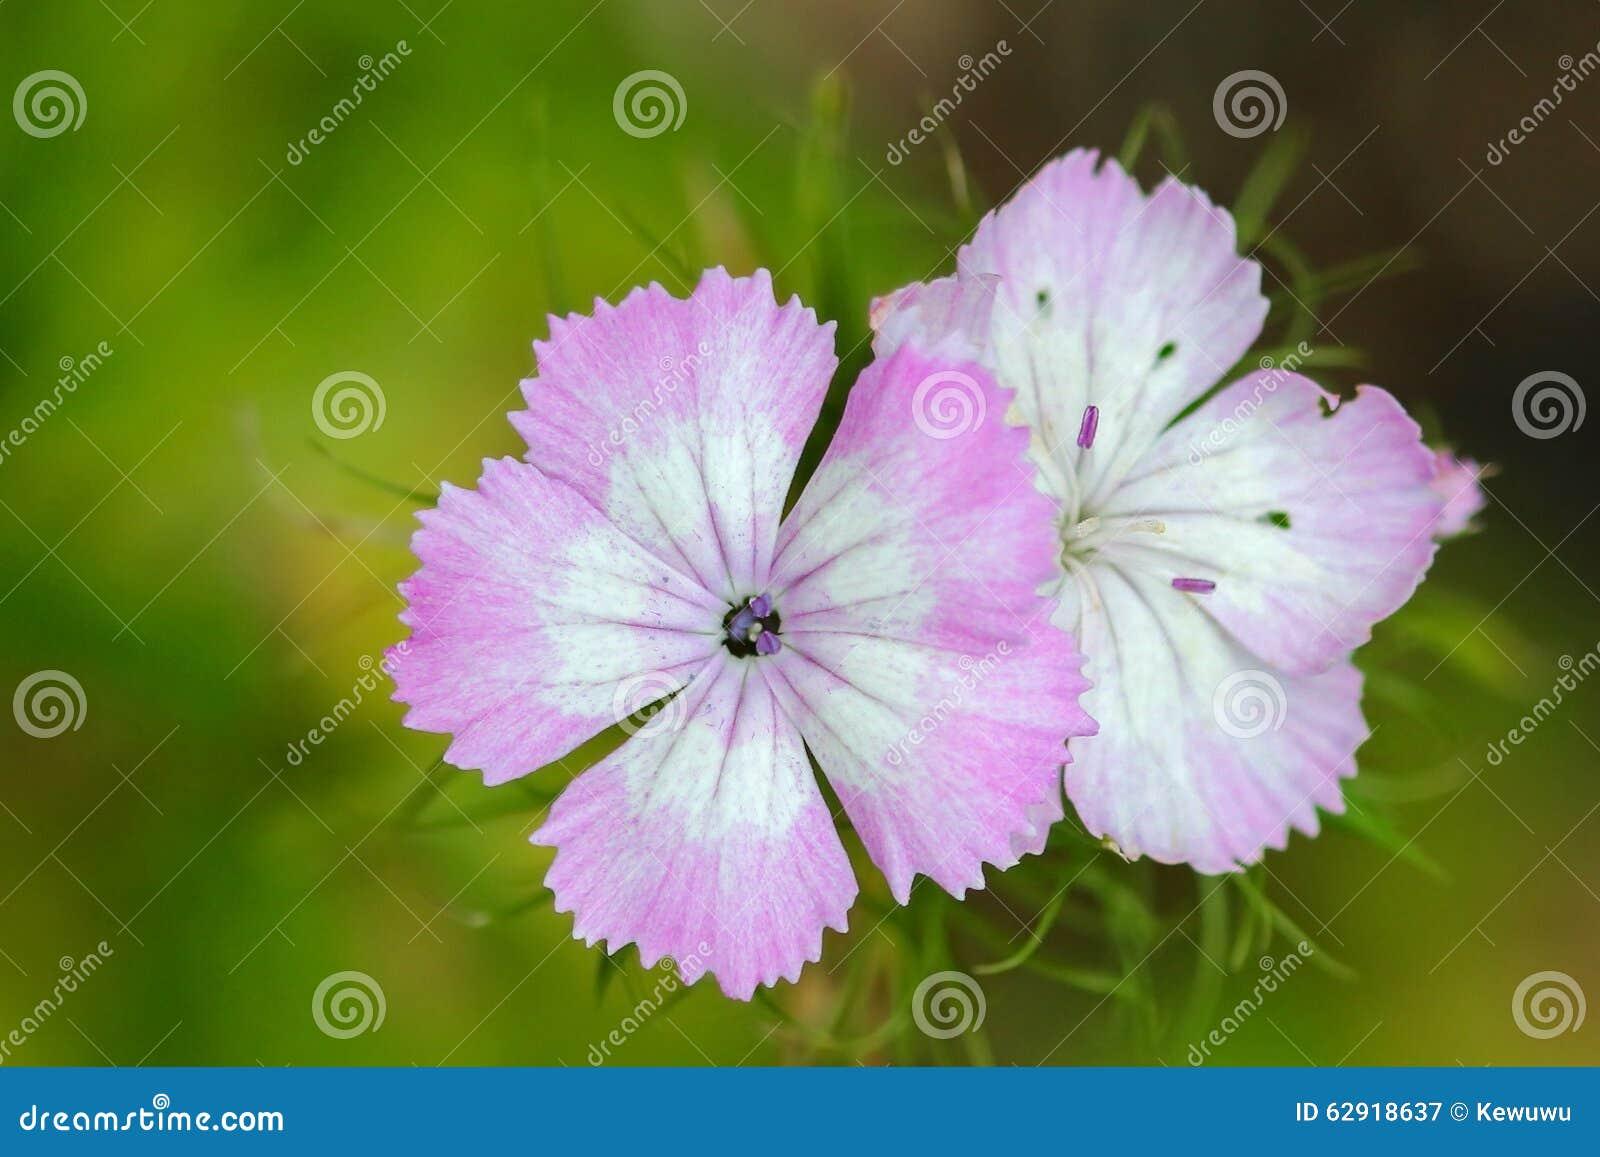 Dianthus Barbatus Sweet William Flower Stock Image Image Of Leaves